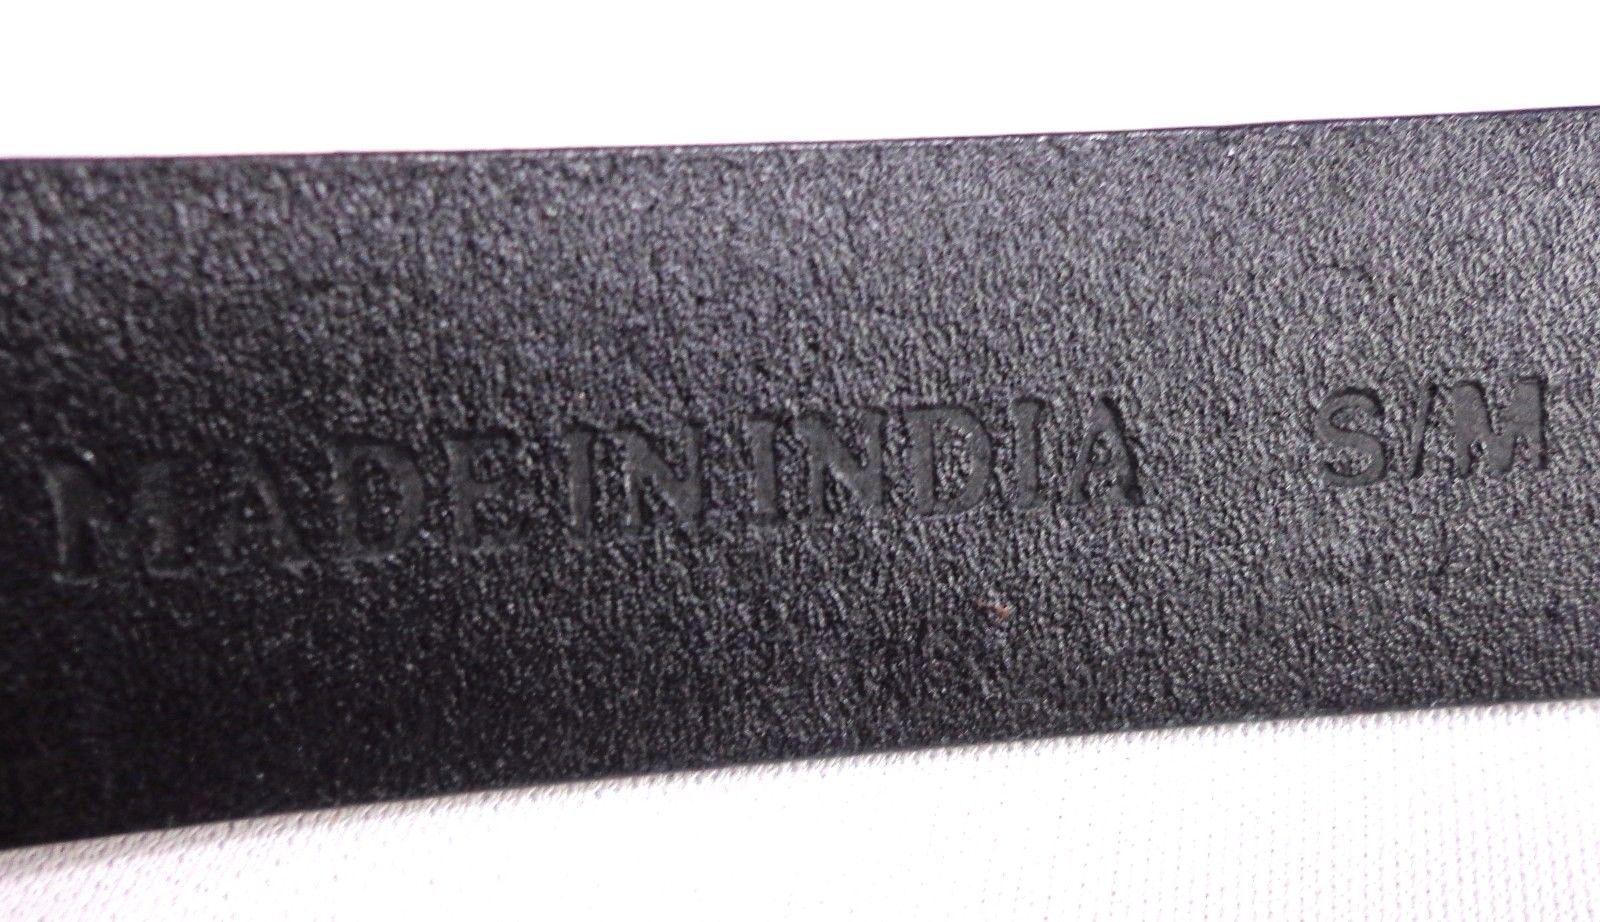 Chico's Womens Adjustable Slide Belt Black Leather Size S / M